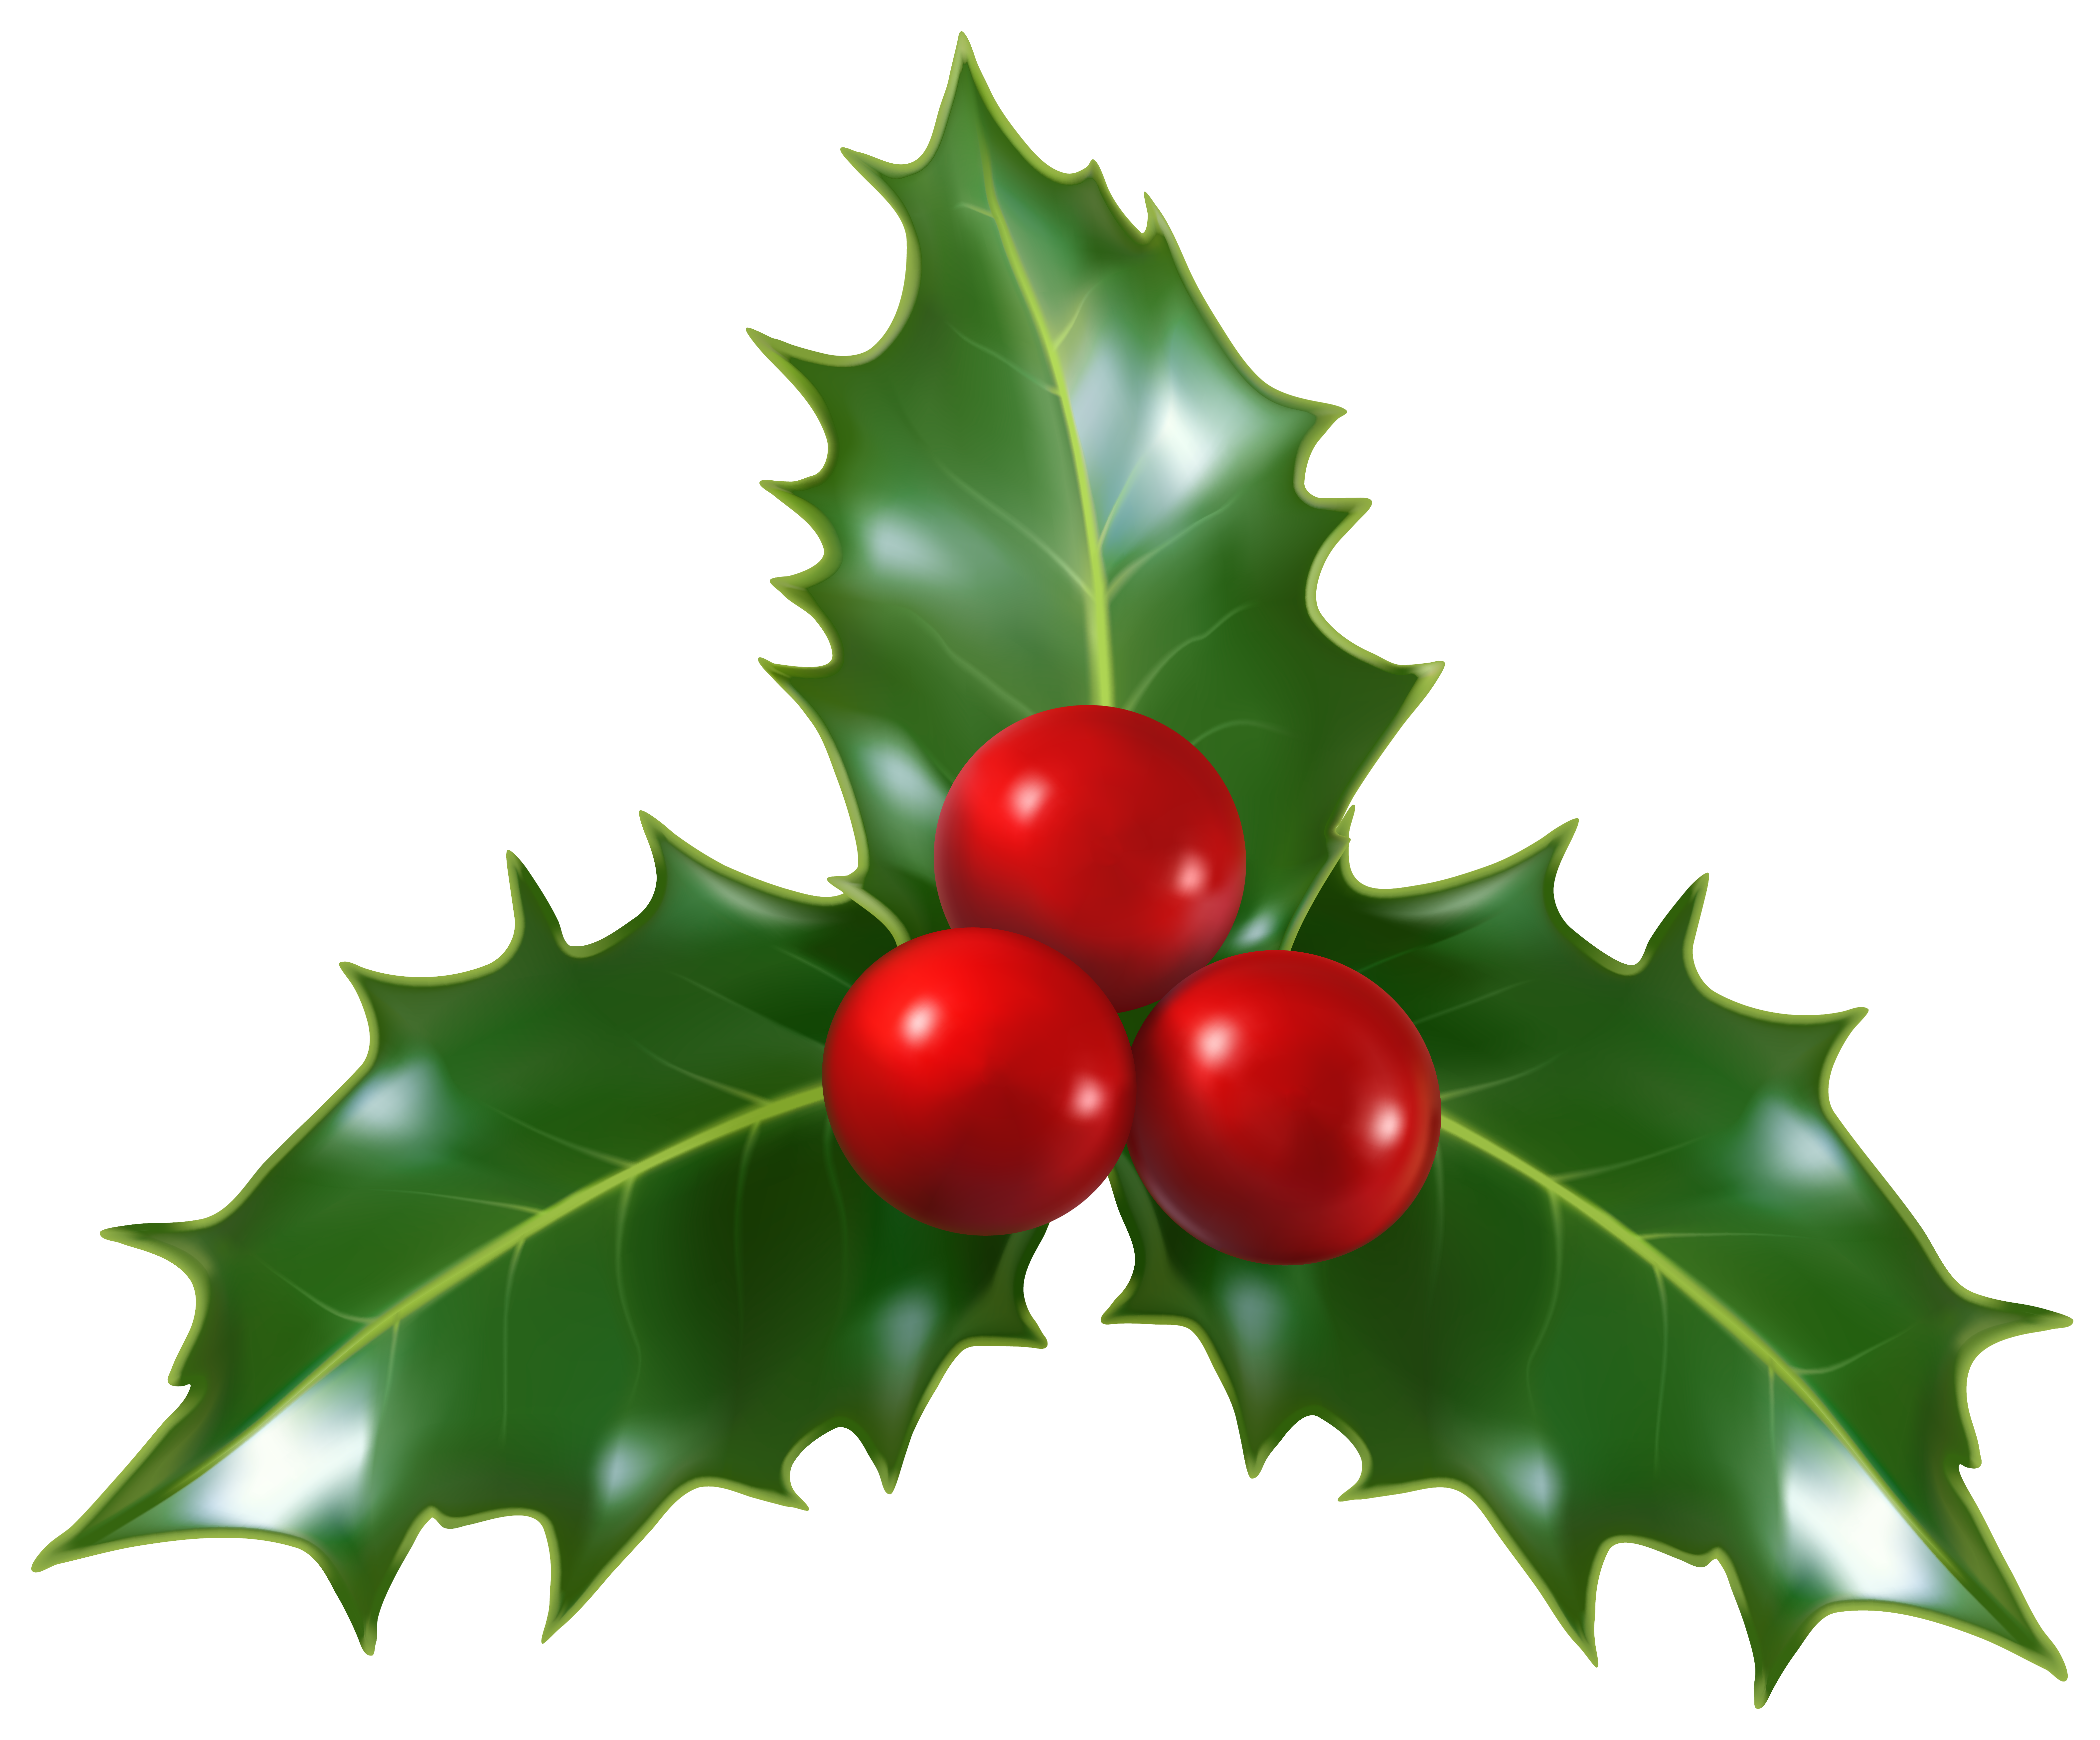 6313x5231 Christmas Holly Mistletoe Png Clip Art Imageu200b Gallery